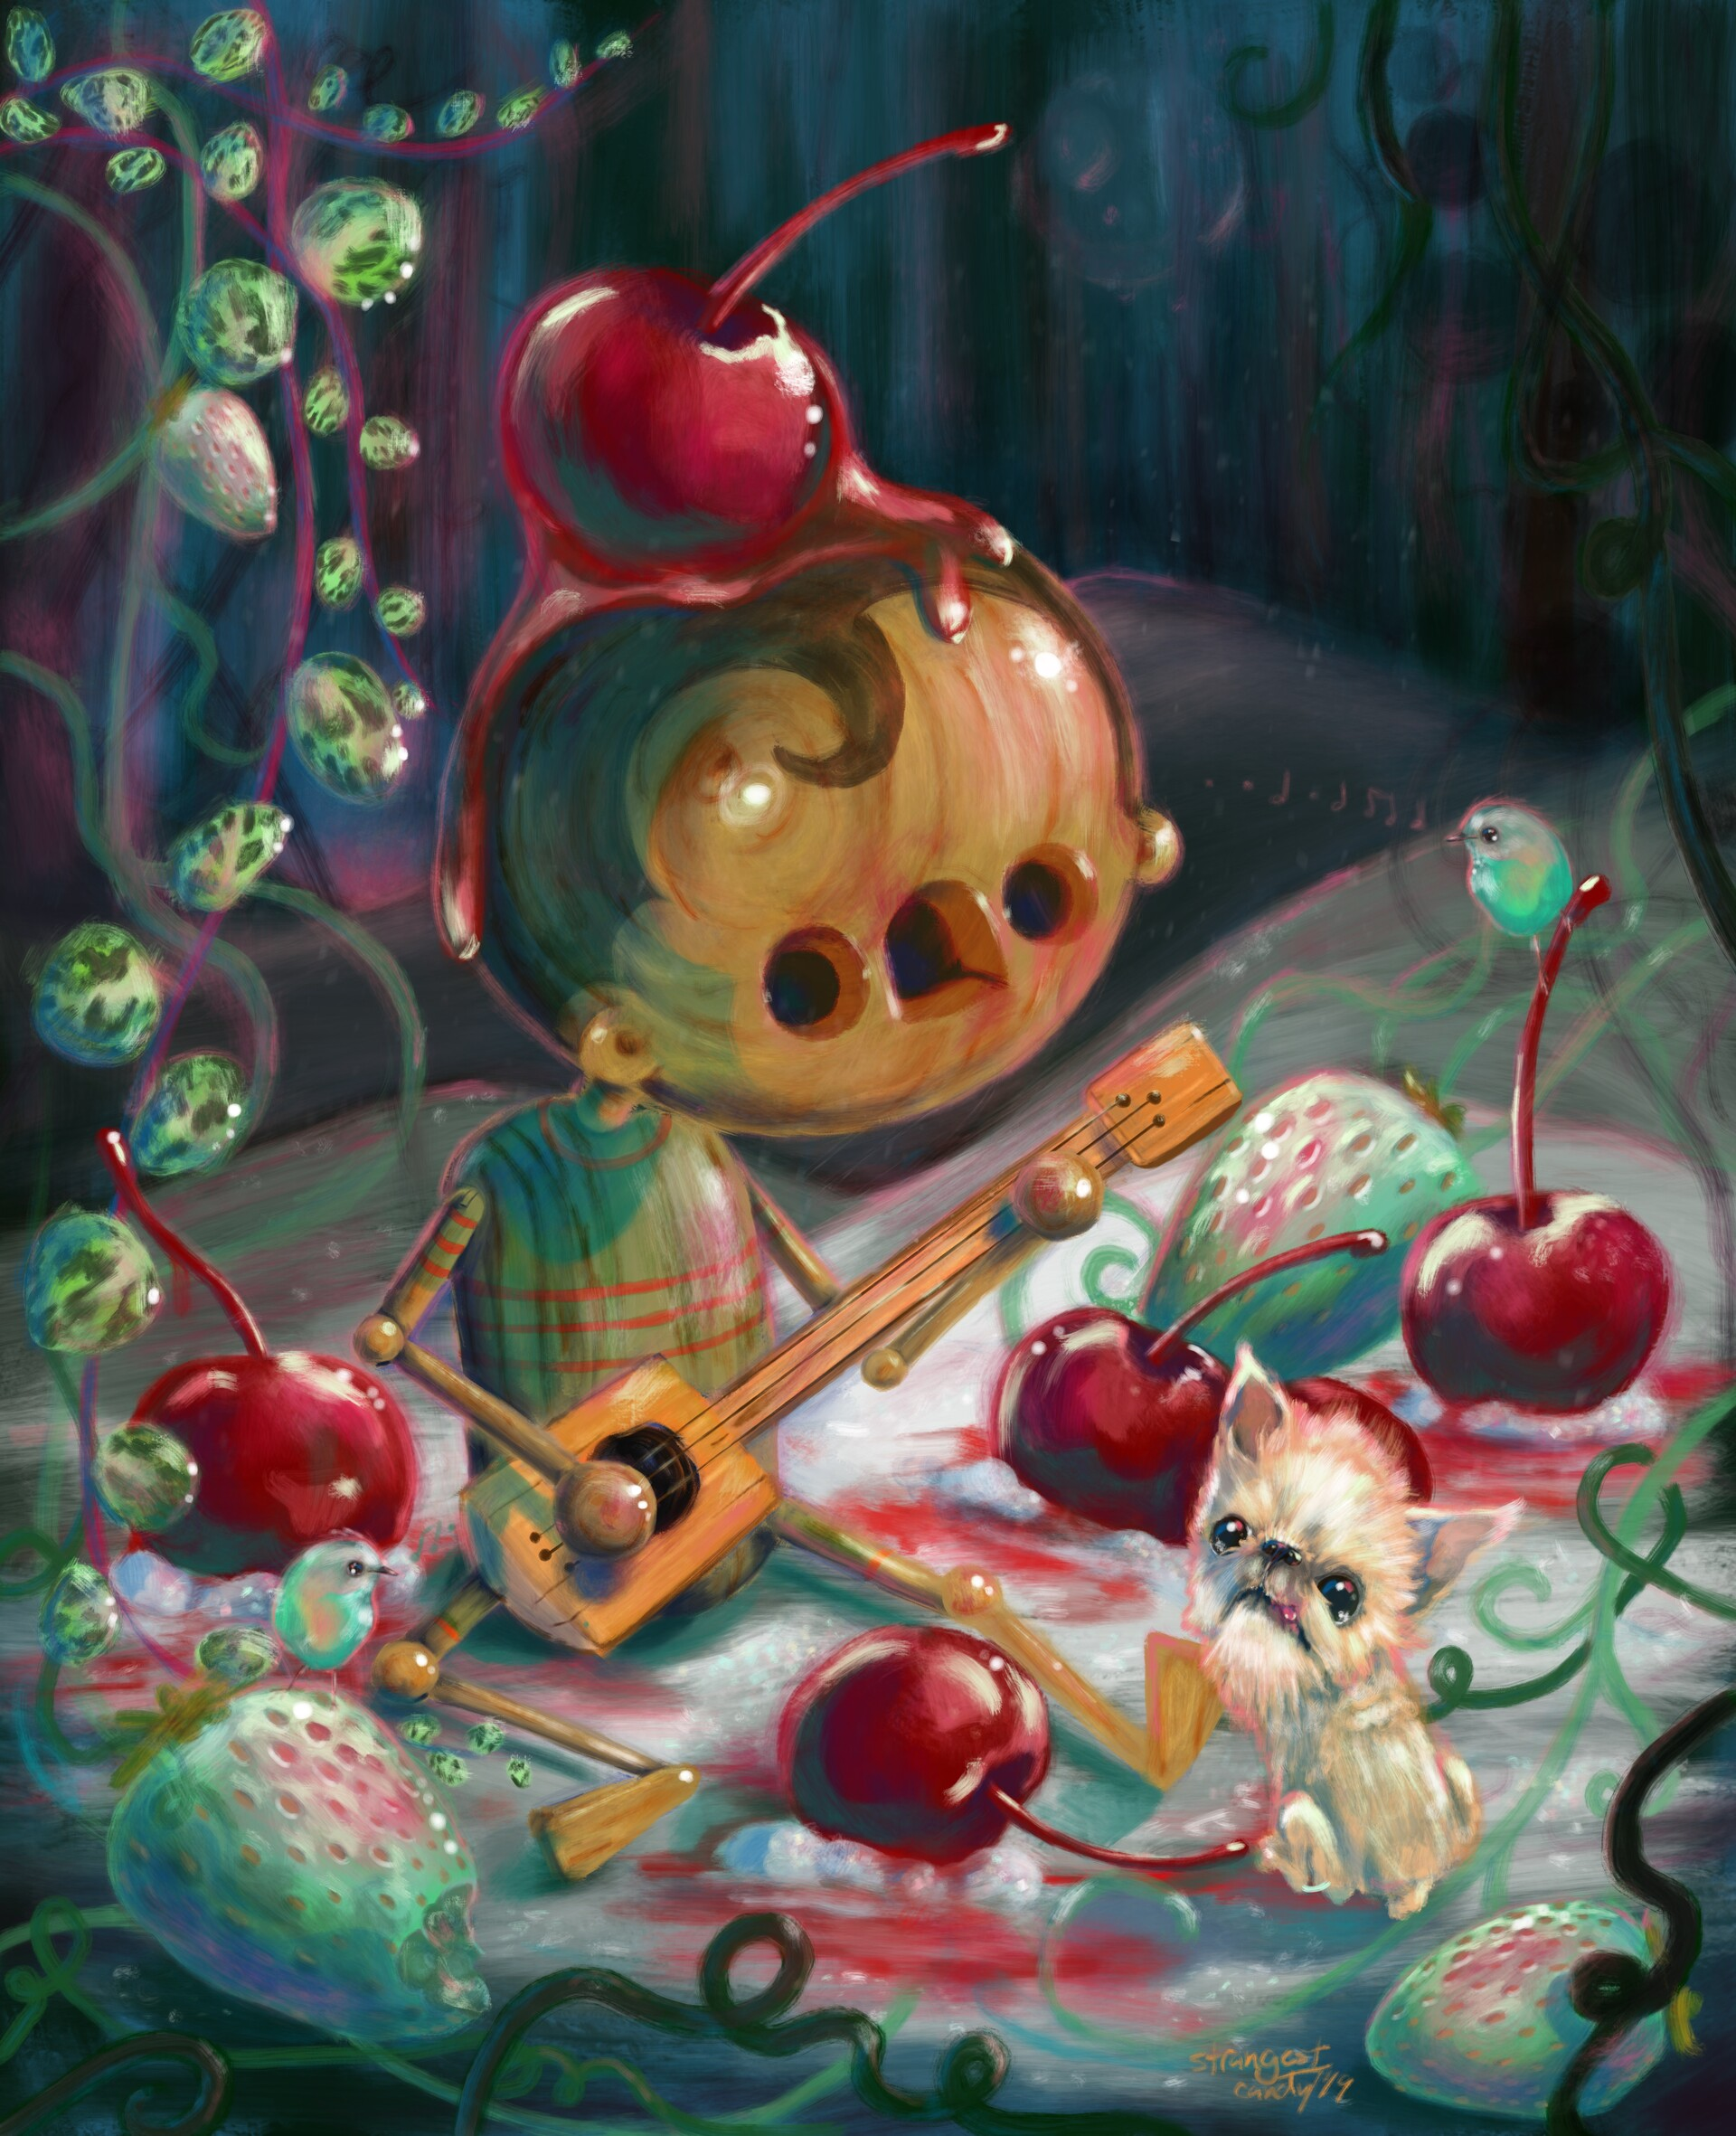 Strangest candy img 0498